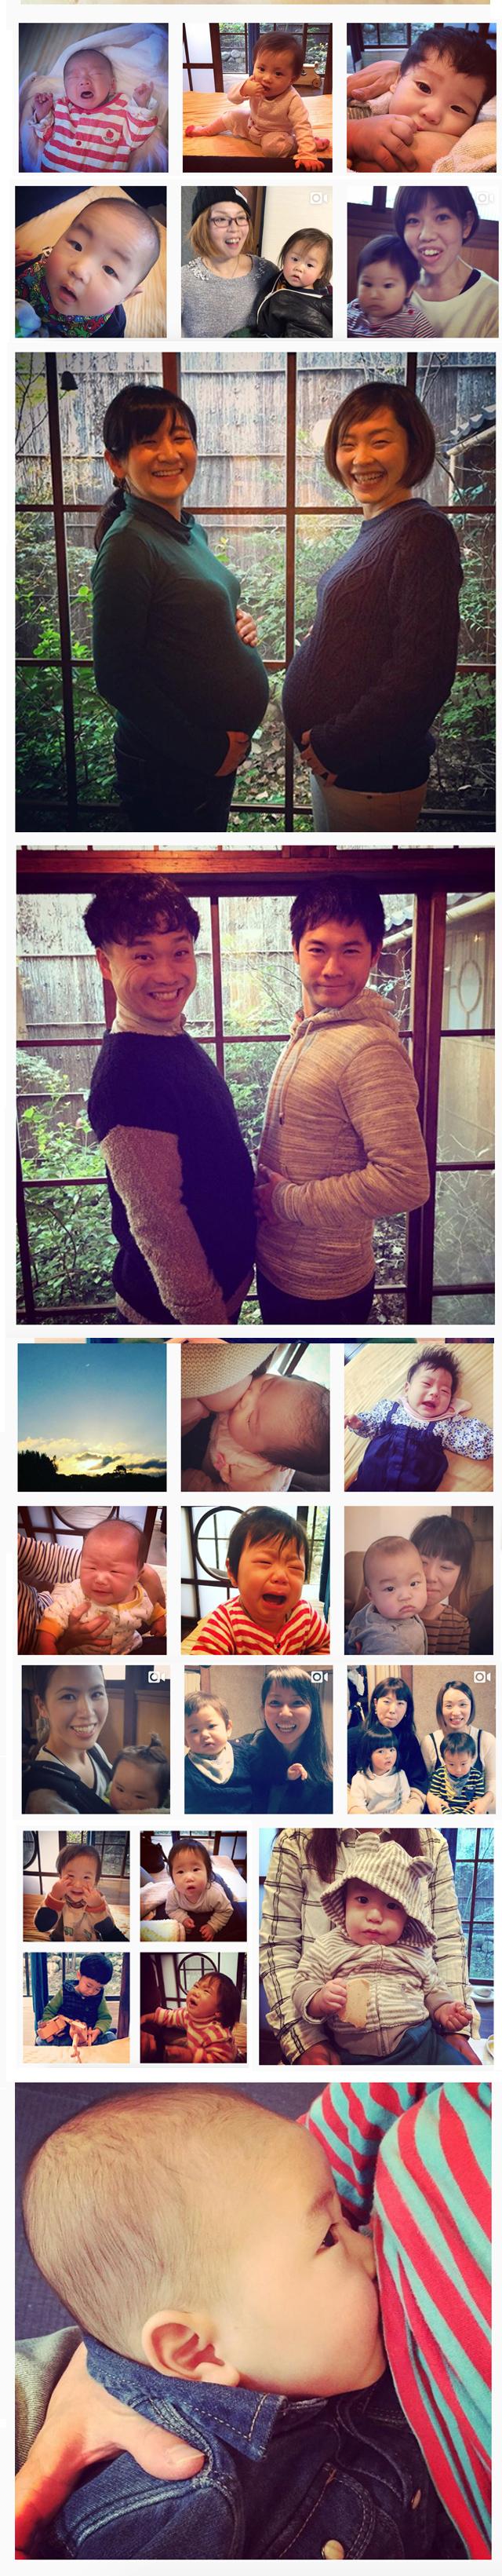 Instagram 09 baby mama - インスタグラム☆フォロアー1000名達成☆ありがとう!